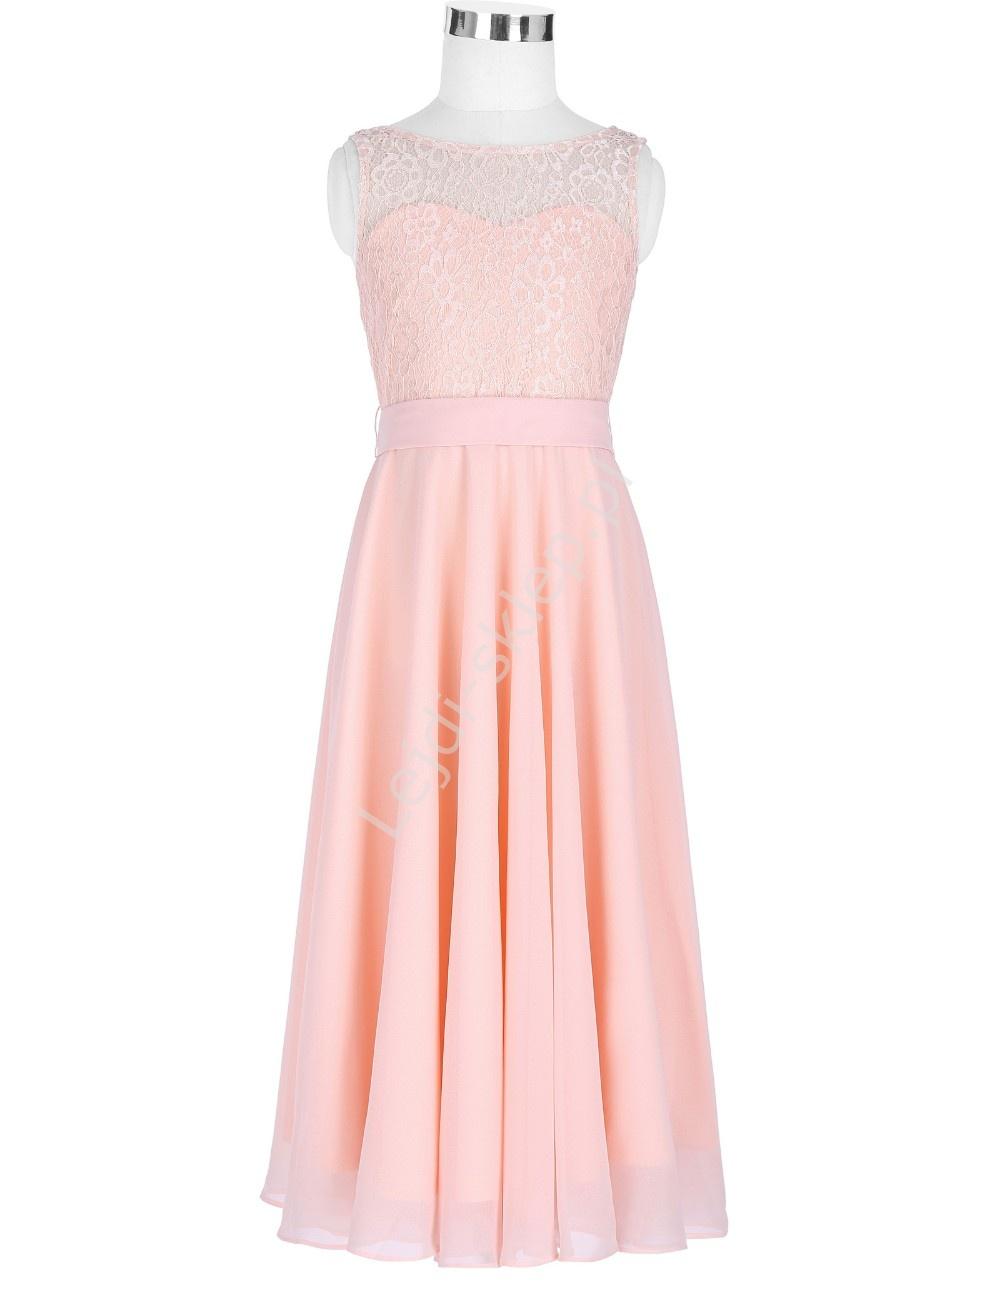 bd852a22d4 Jasnoróżowa elegancka skromna sukienka dla dziewczynki - Lejdi.pl